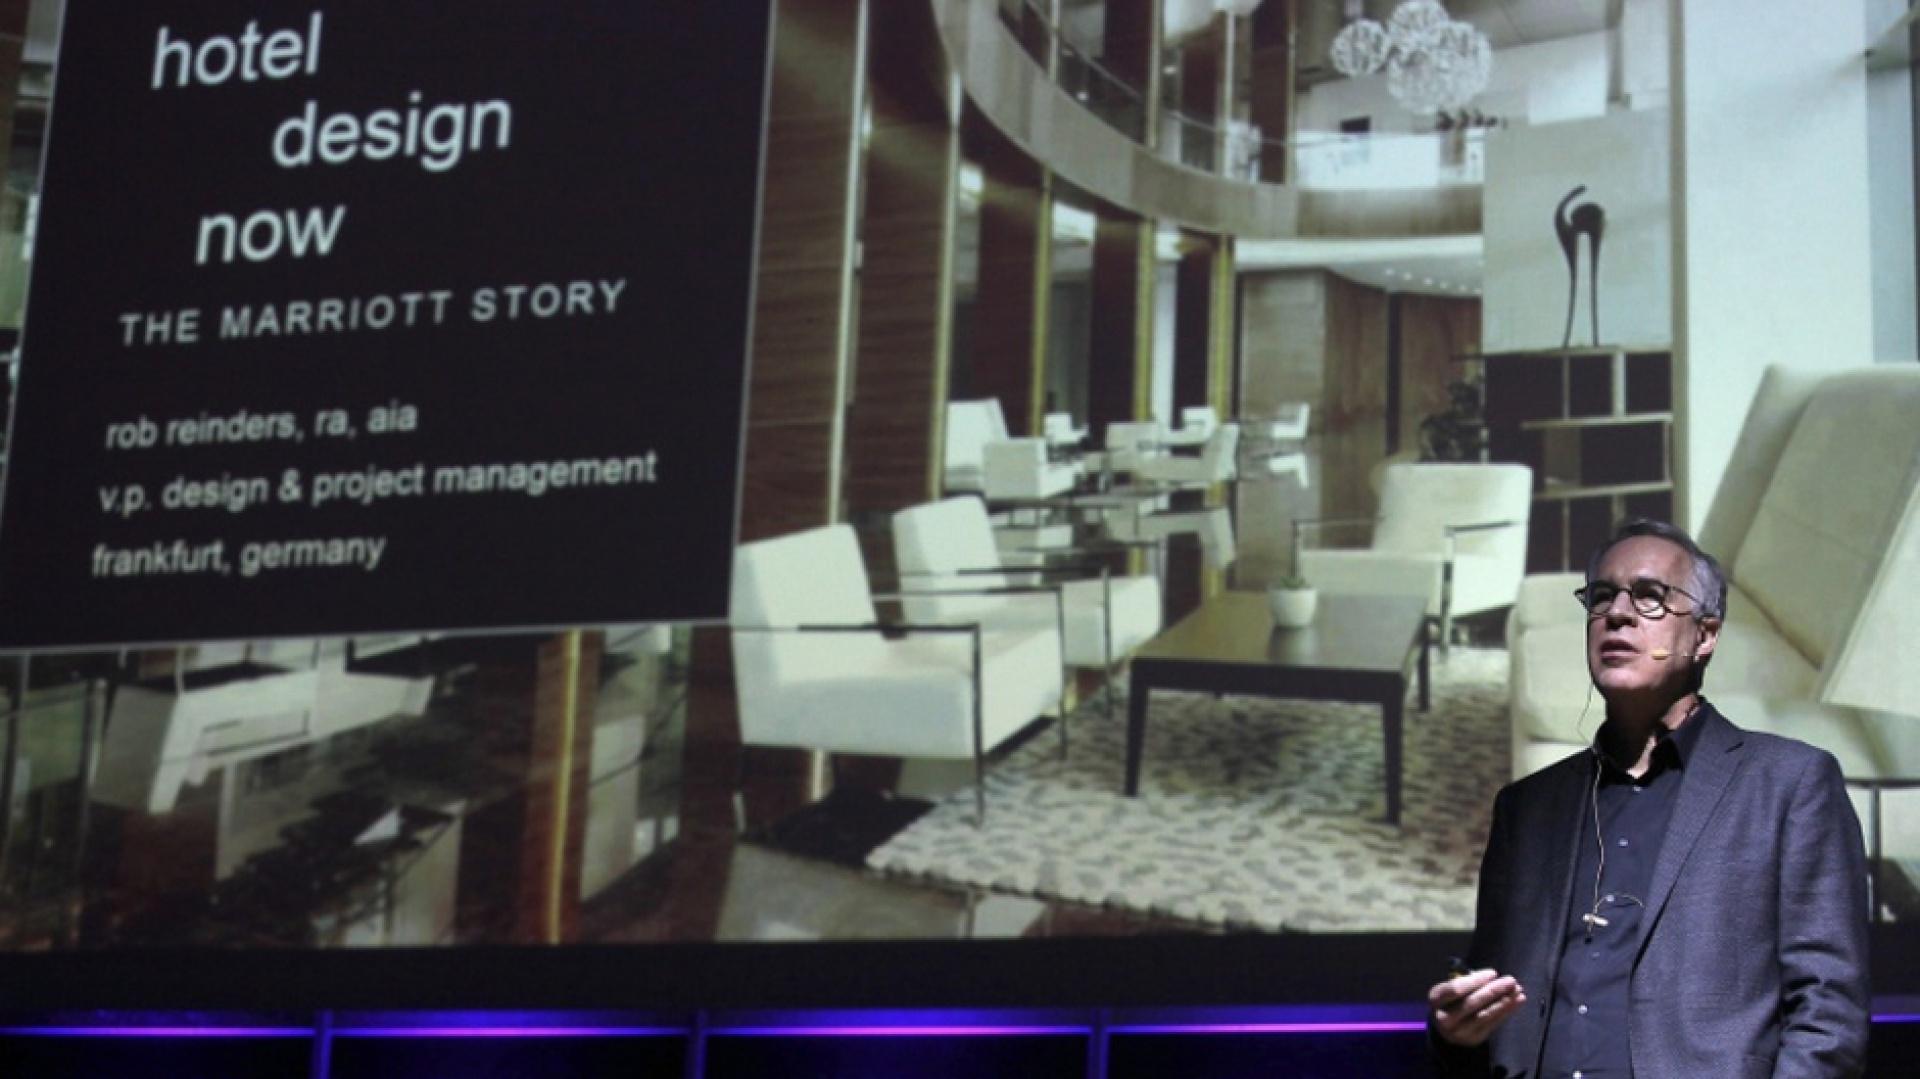 Rob Reinders, Vice President, Design Management w Marriott International - Architecture & Construction, podczas 4 Design Days